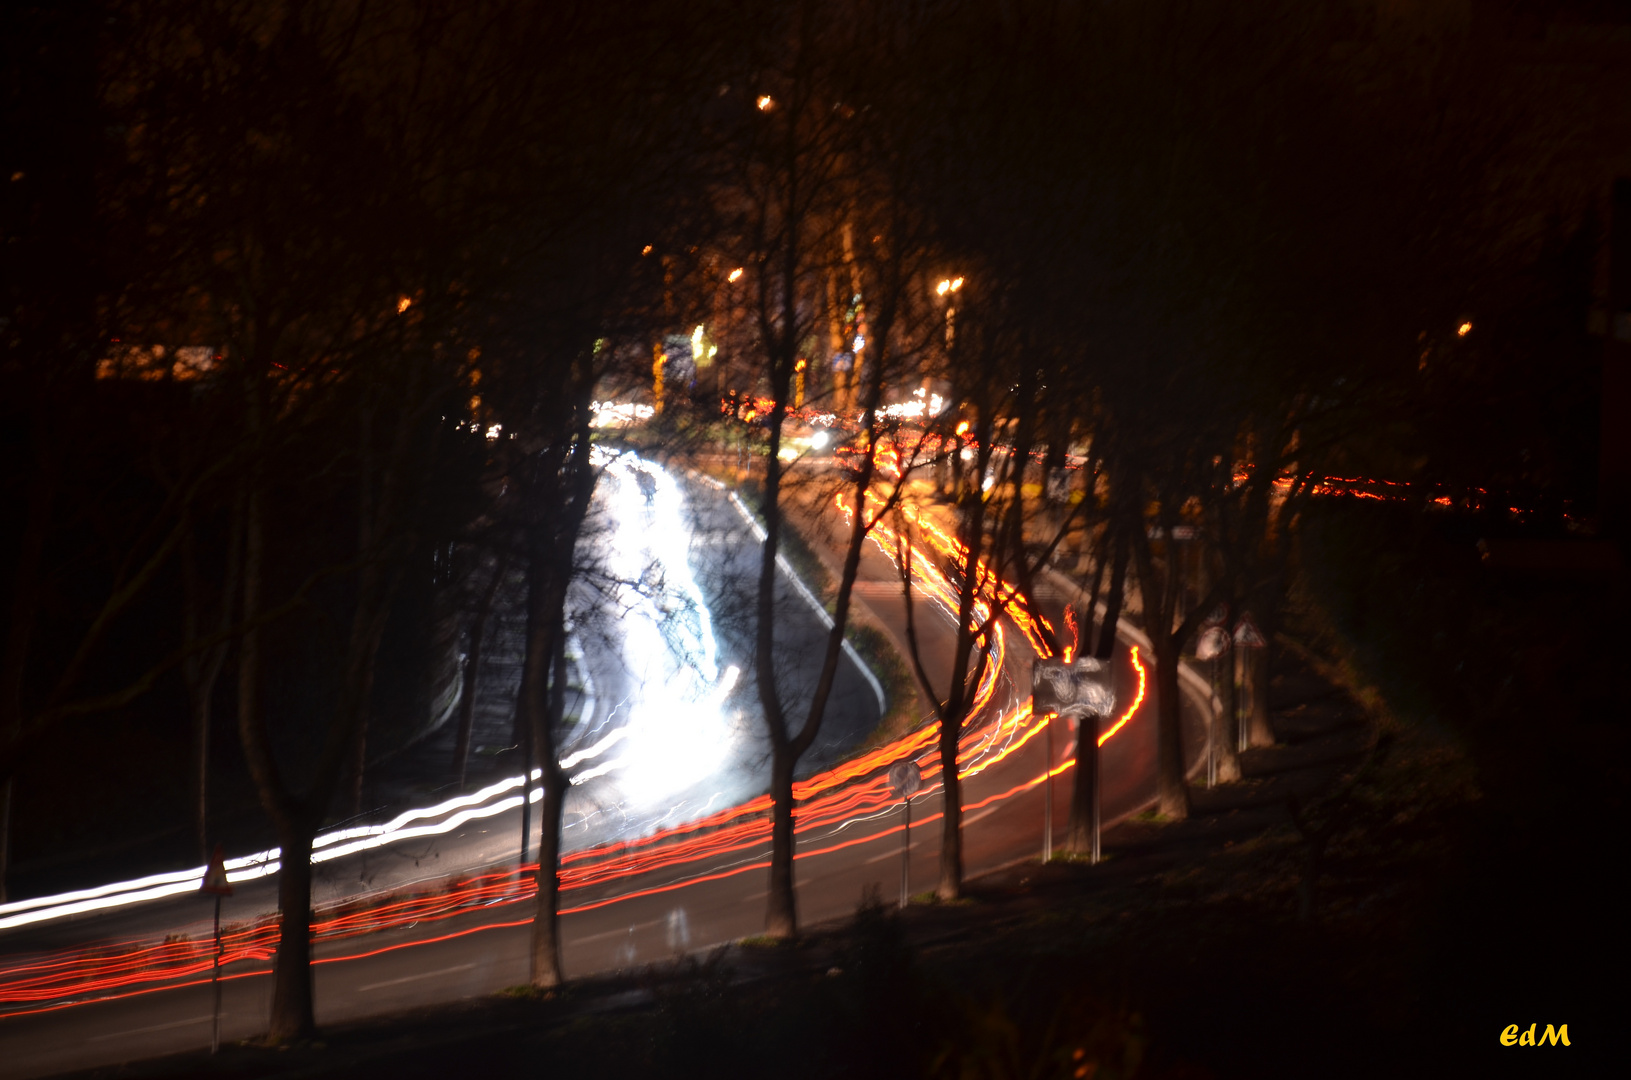 strada notturna